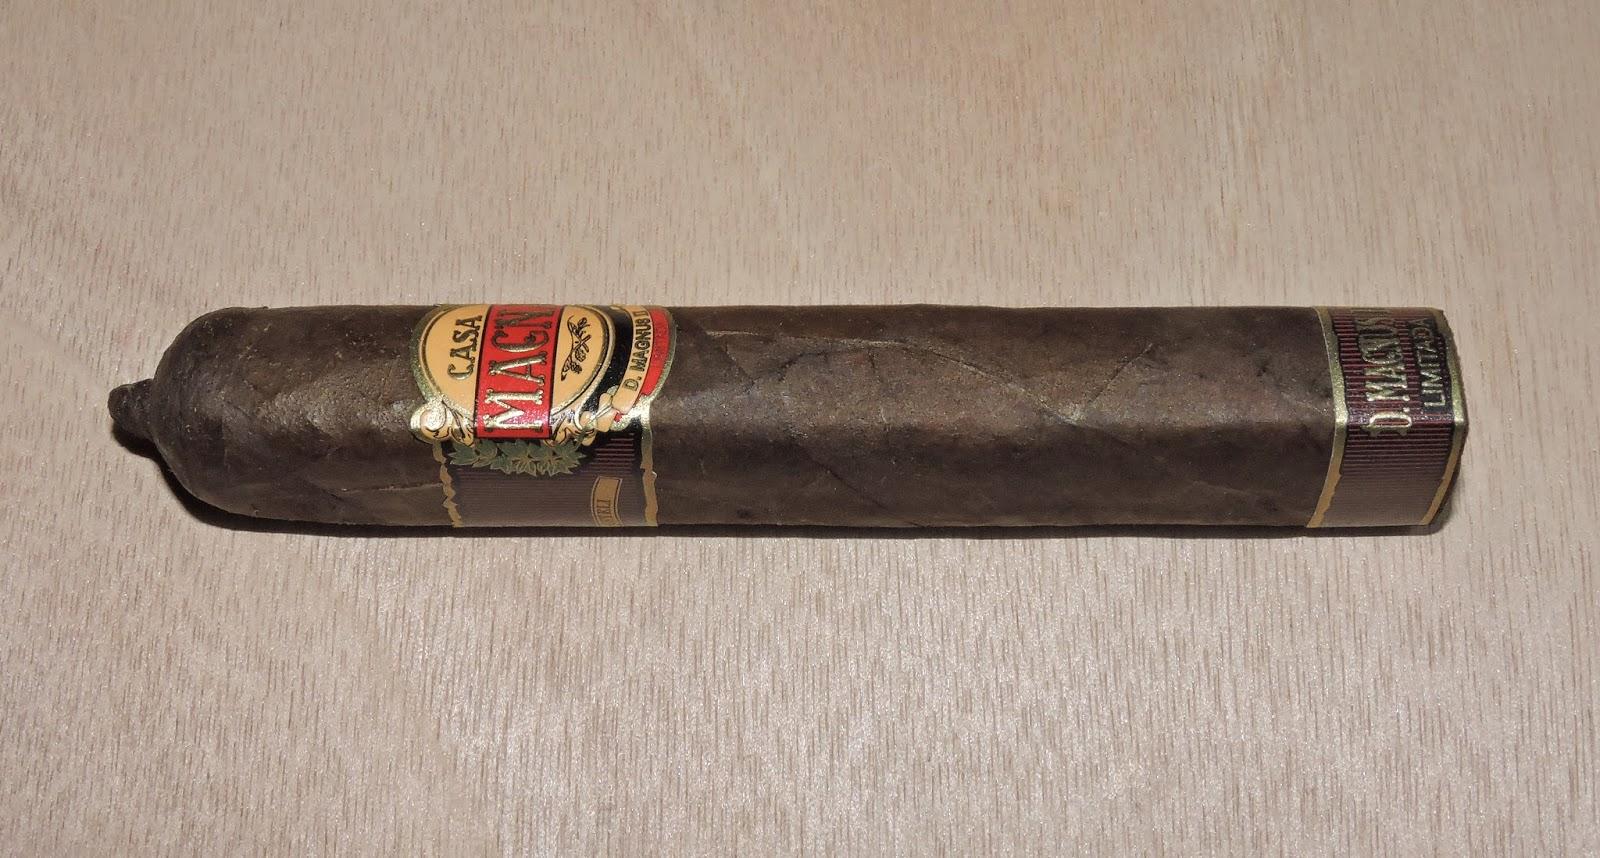 2015 Cigar of the Year Countdown: #26 Casa Magna D. Magnus II Trajan by Quesada Cigars (Part 5 of The Box Worthy 30)